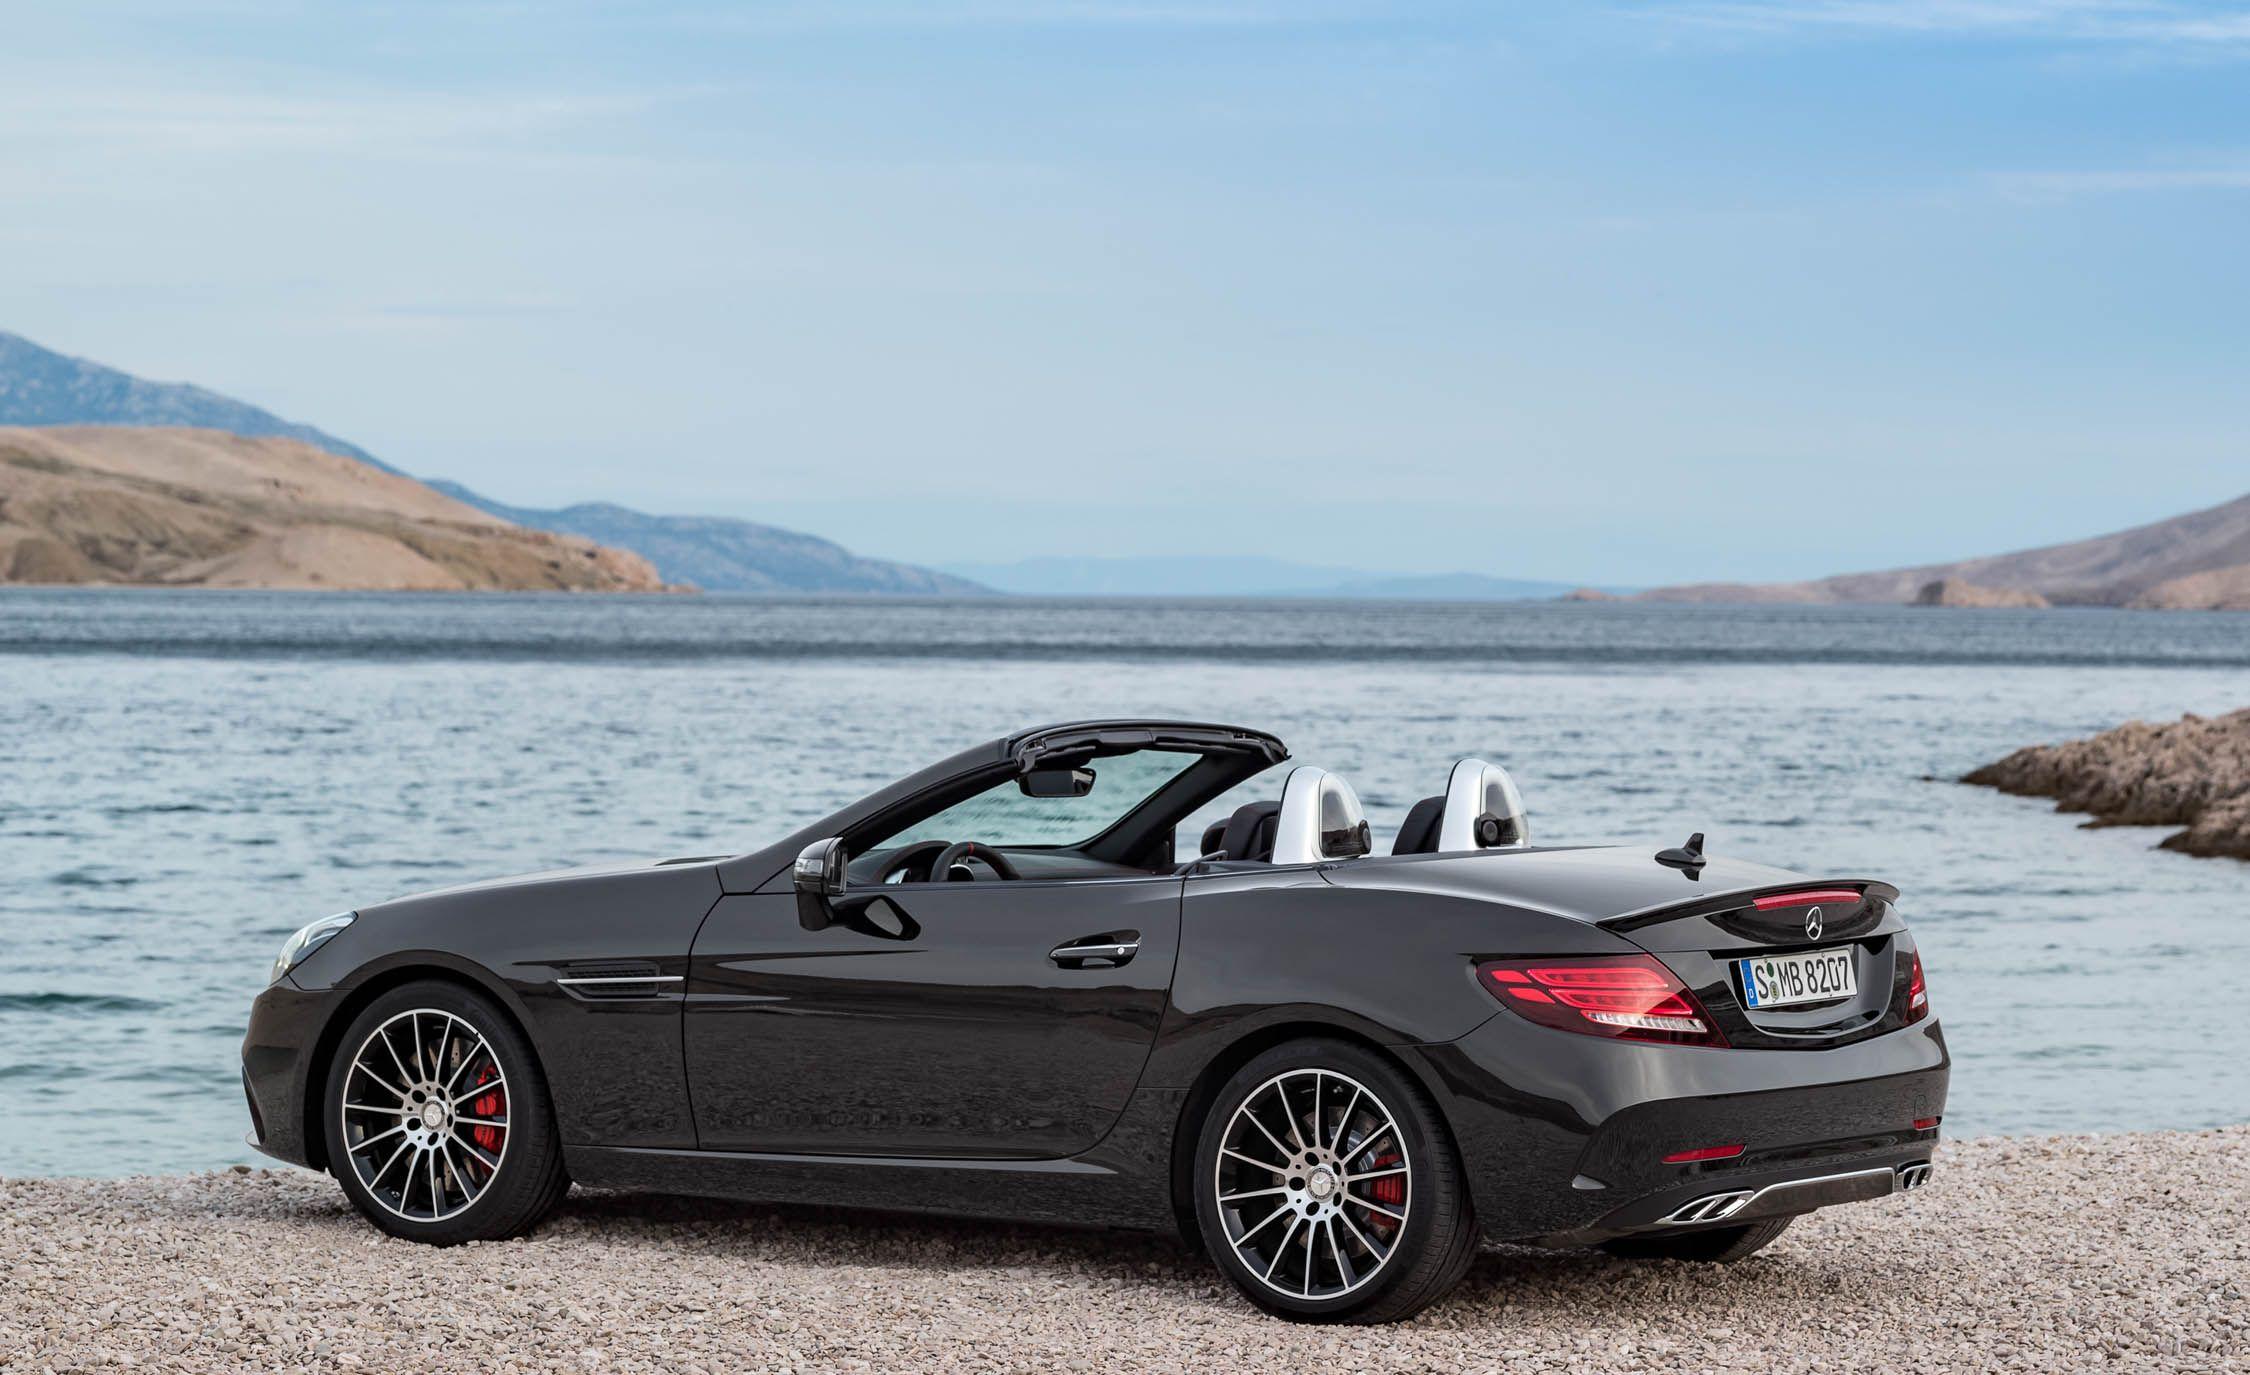 2019 Mercedes Amg Slc43 Reviews Price Photos And Specs Car Driver